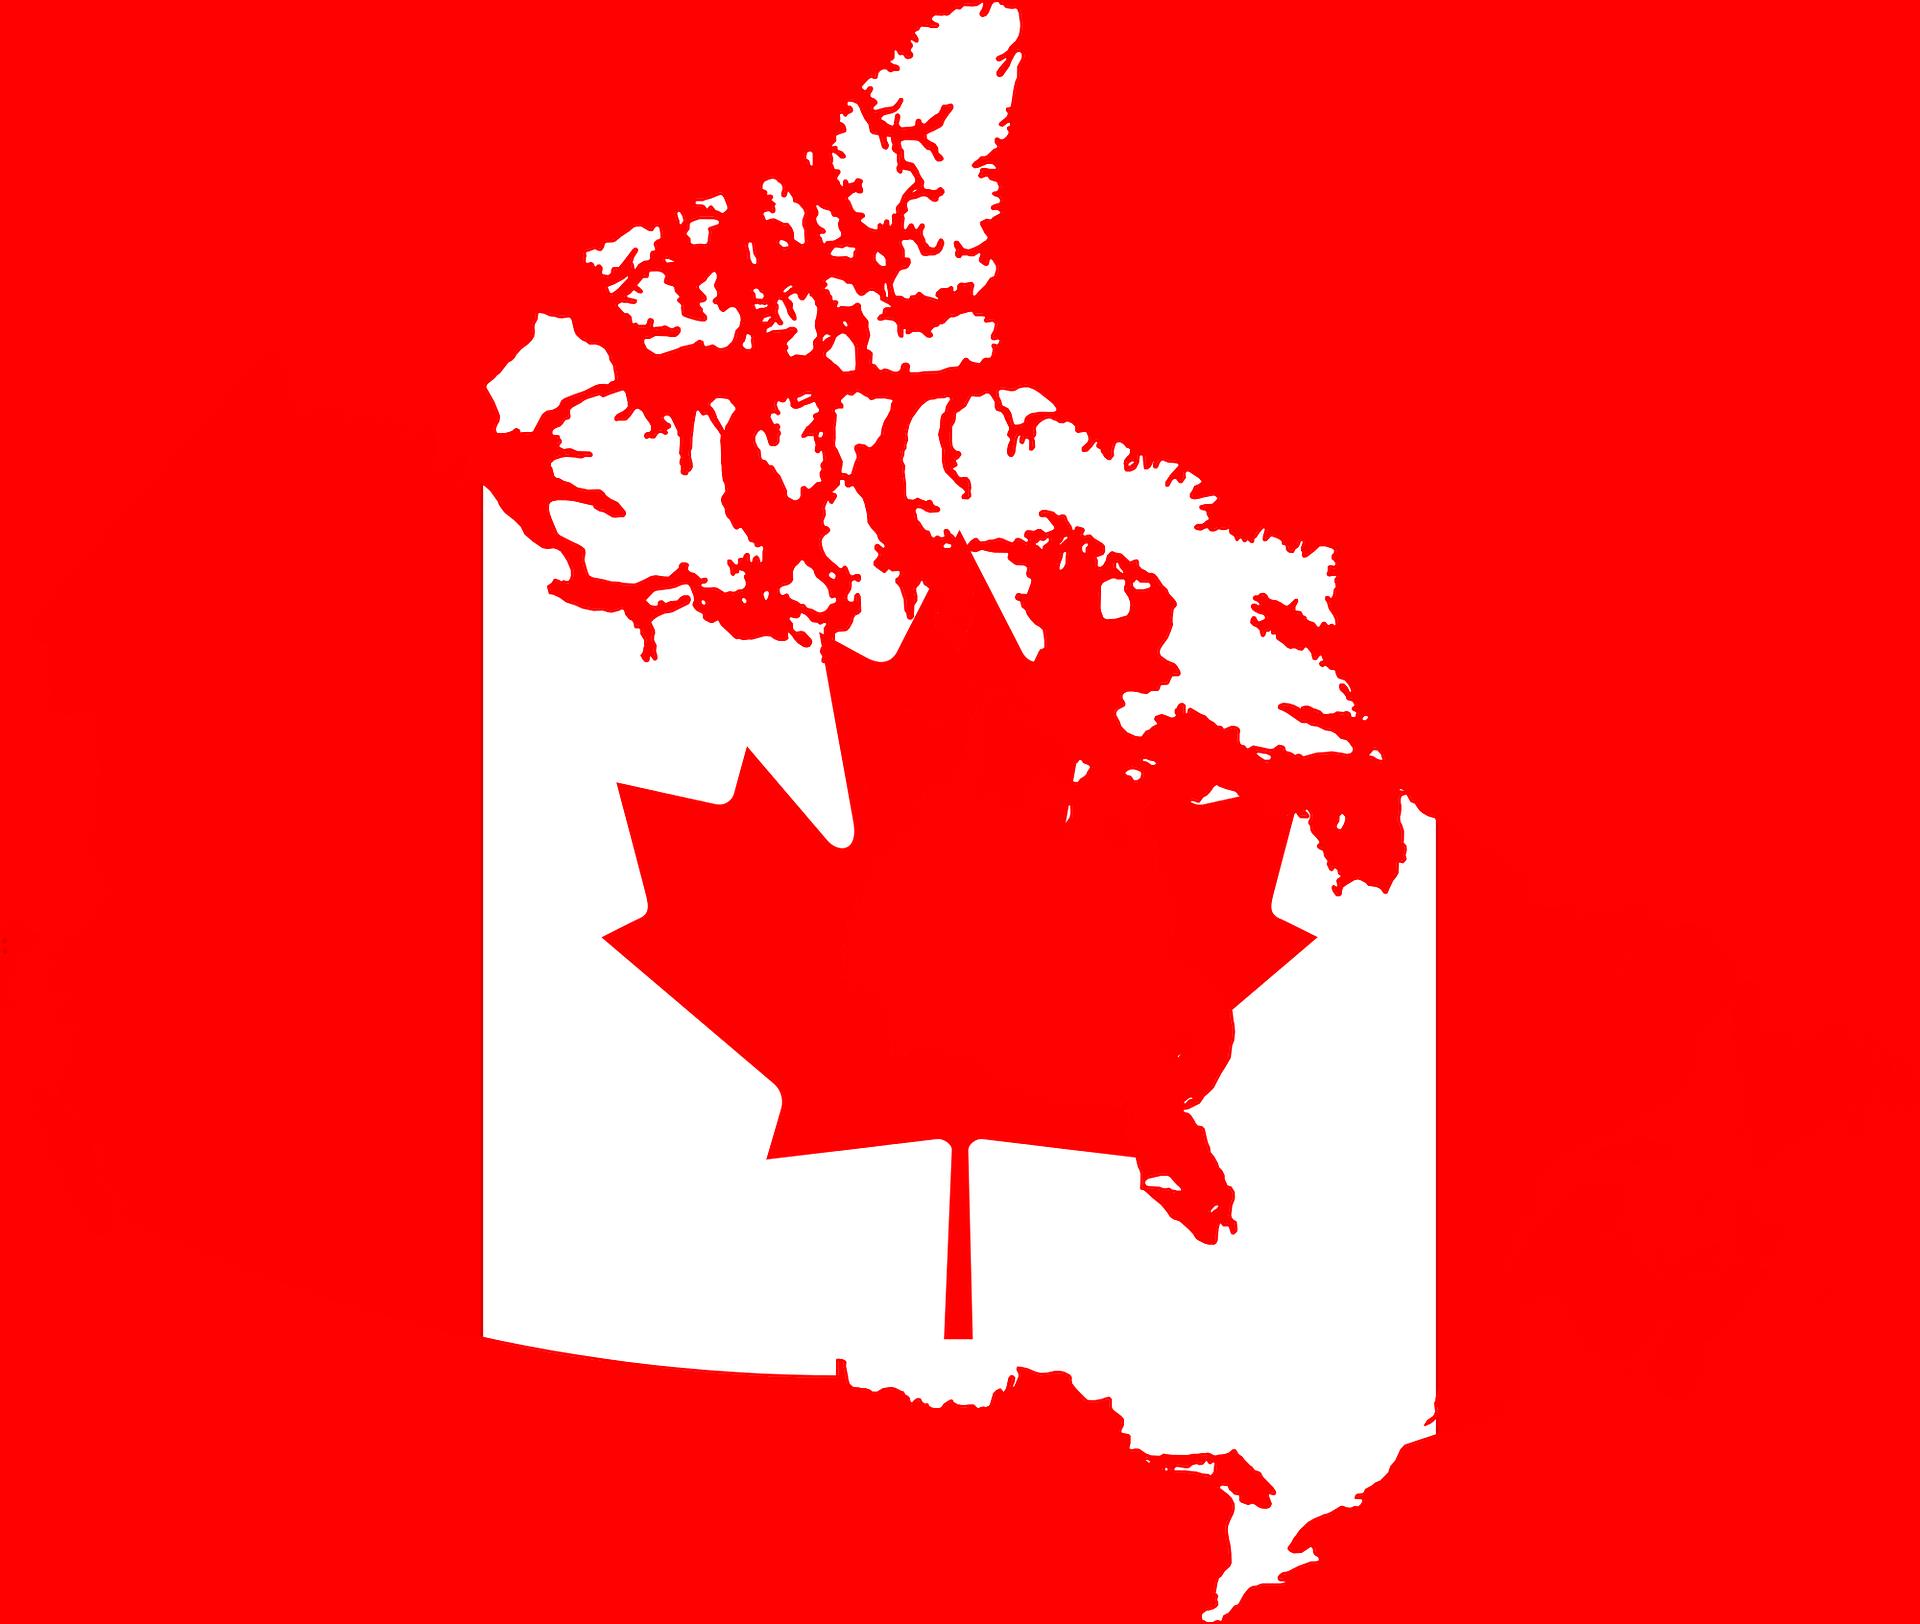 Was ist eTA Visum für Kanada? – Electronic Travel Authorization